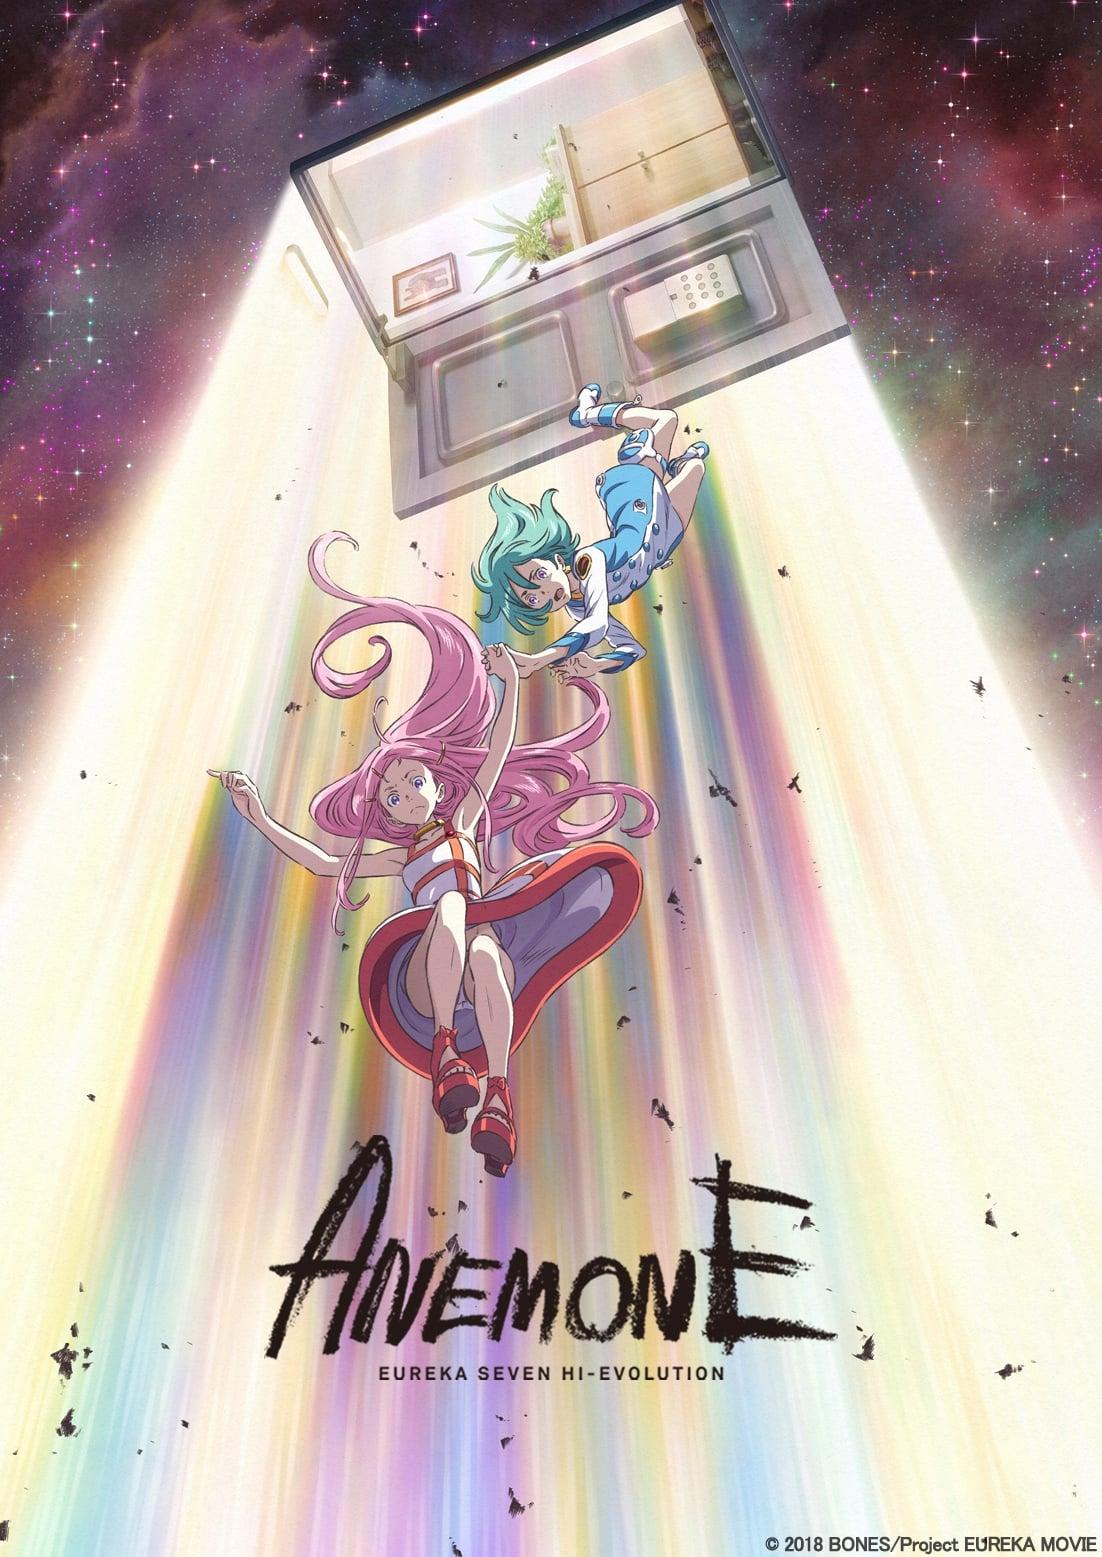 Anemone: Eureka Seven Hi-Evolution (2018)